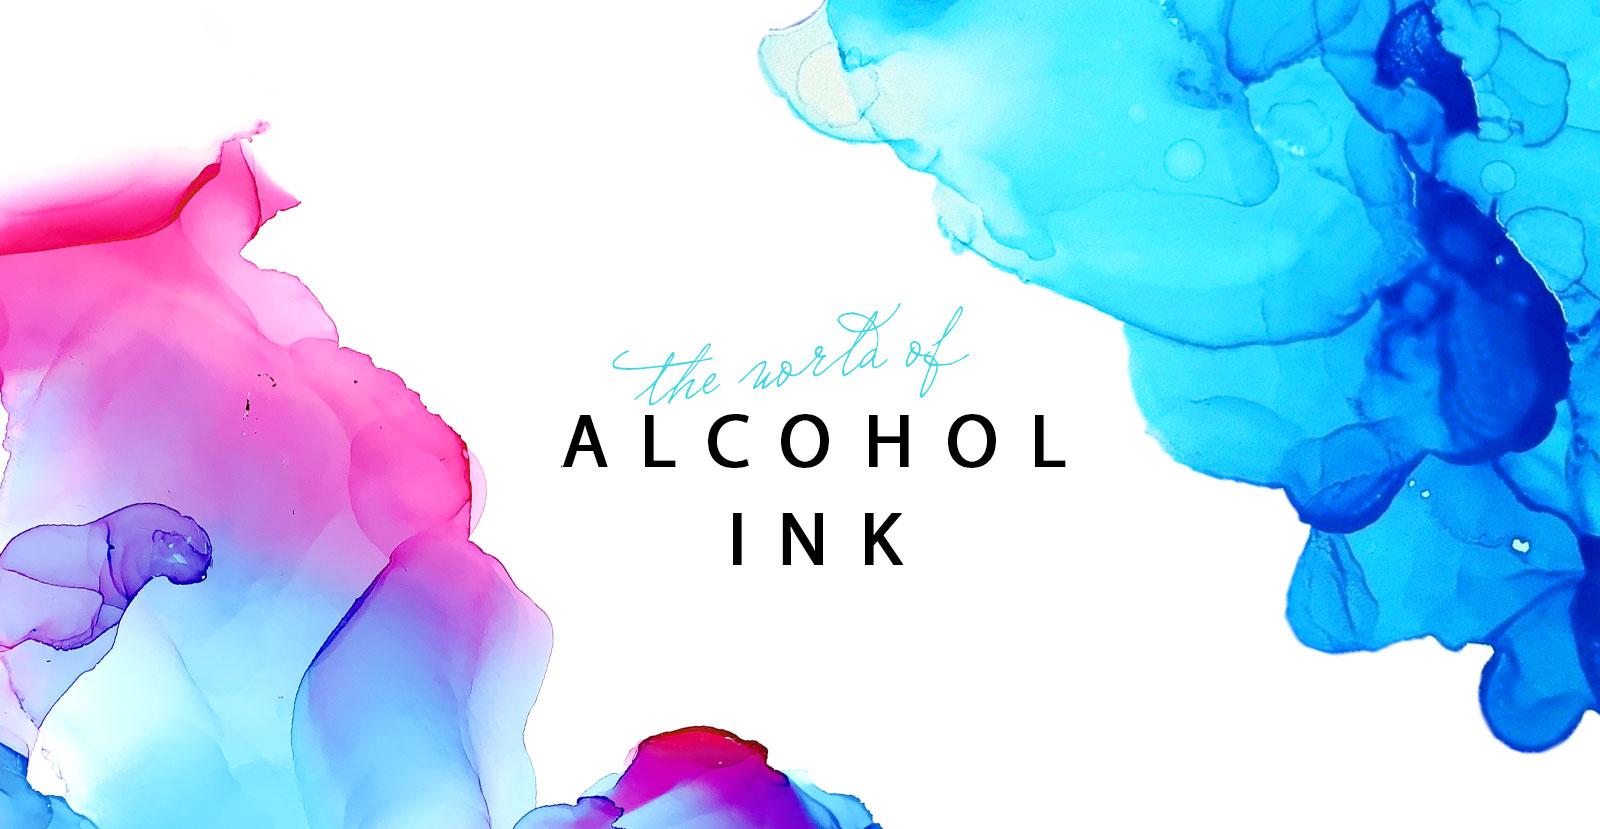 alcoholink_banner_main2.jpg